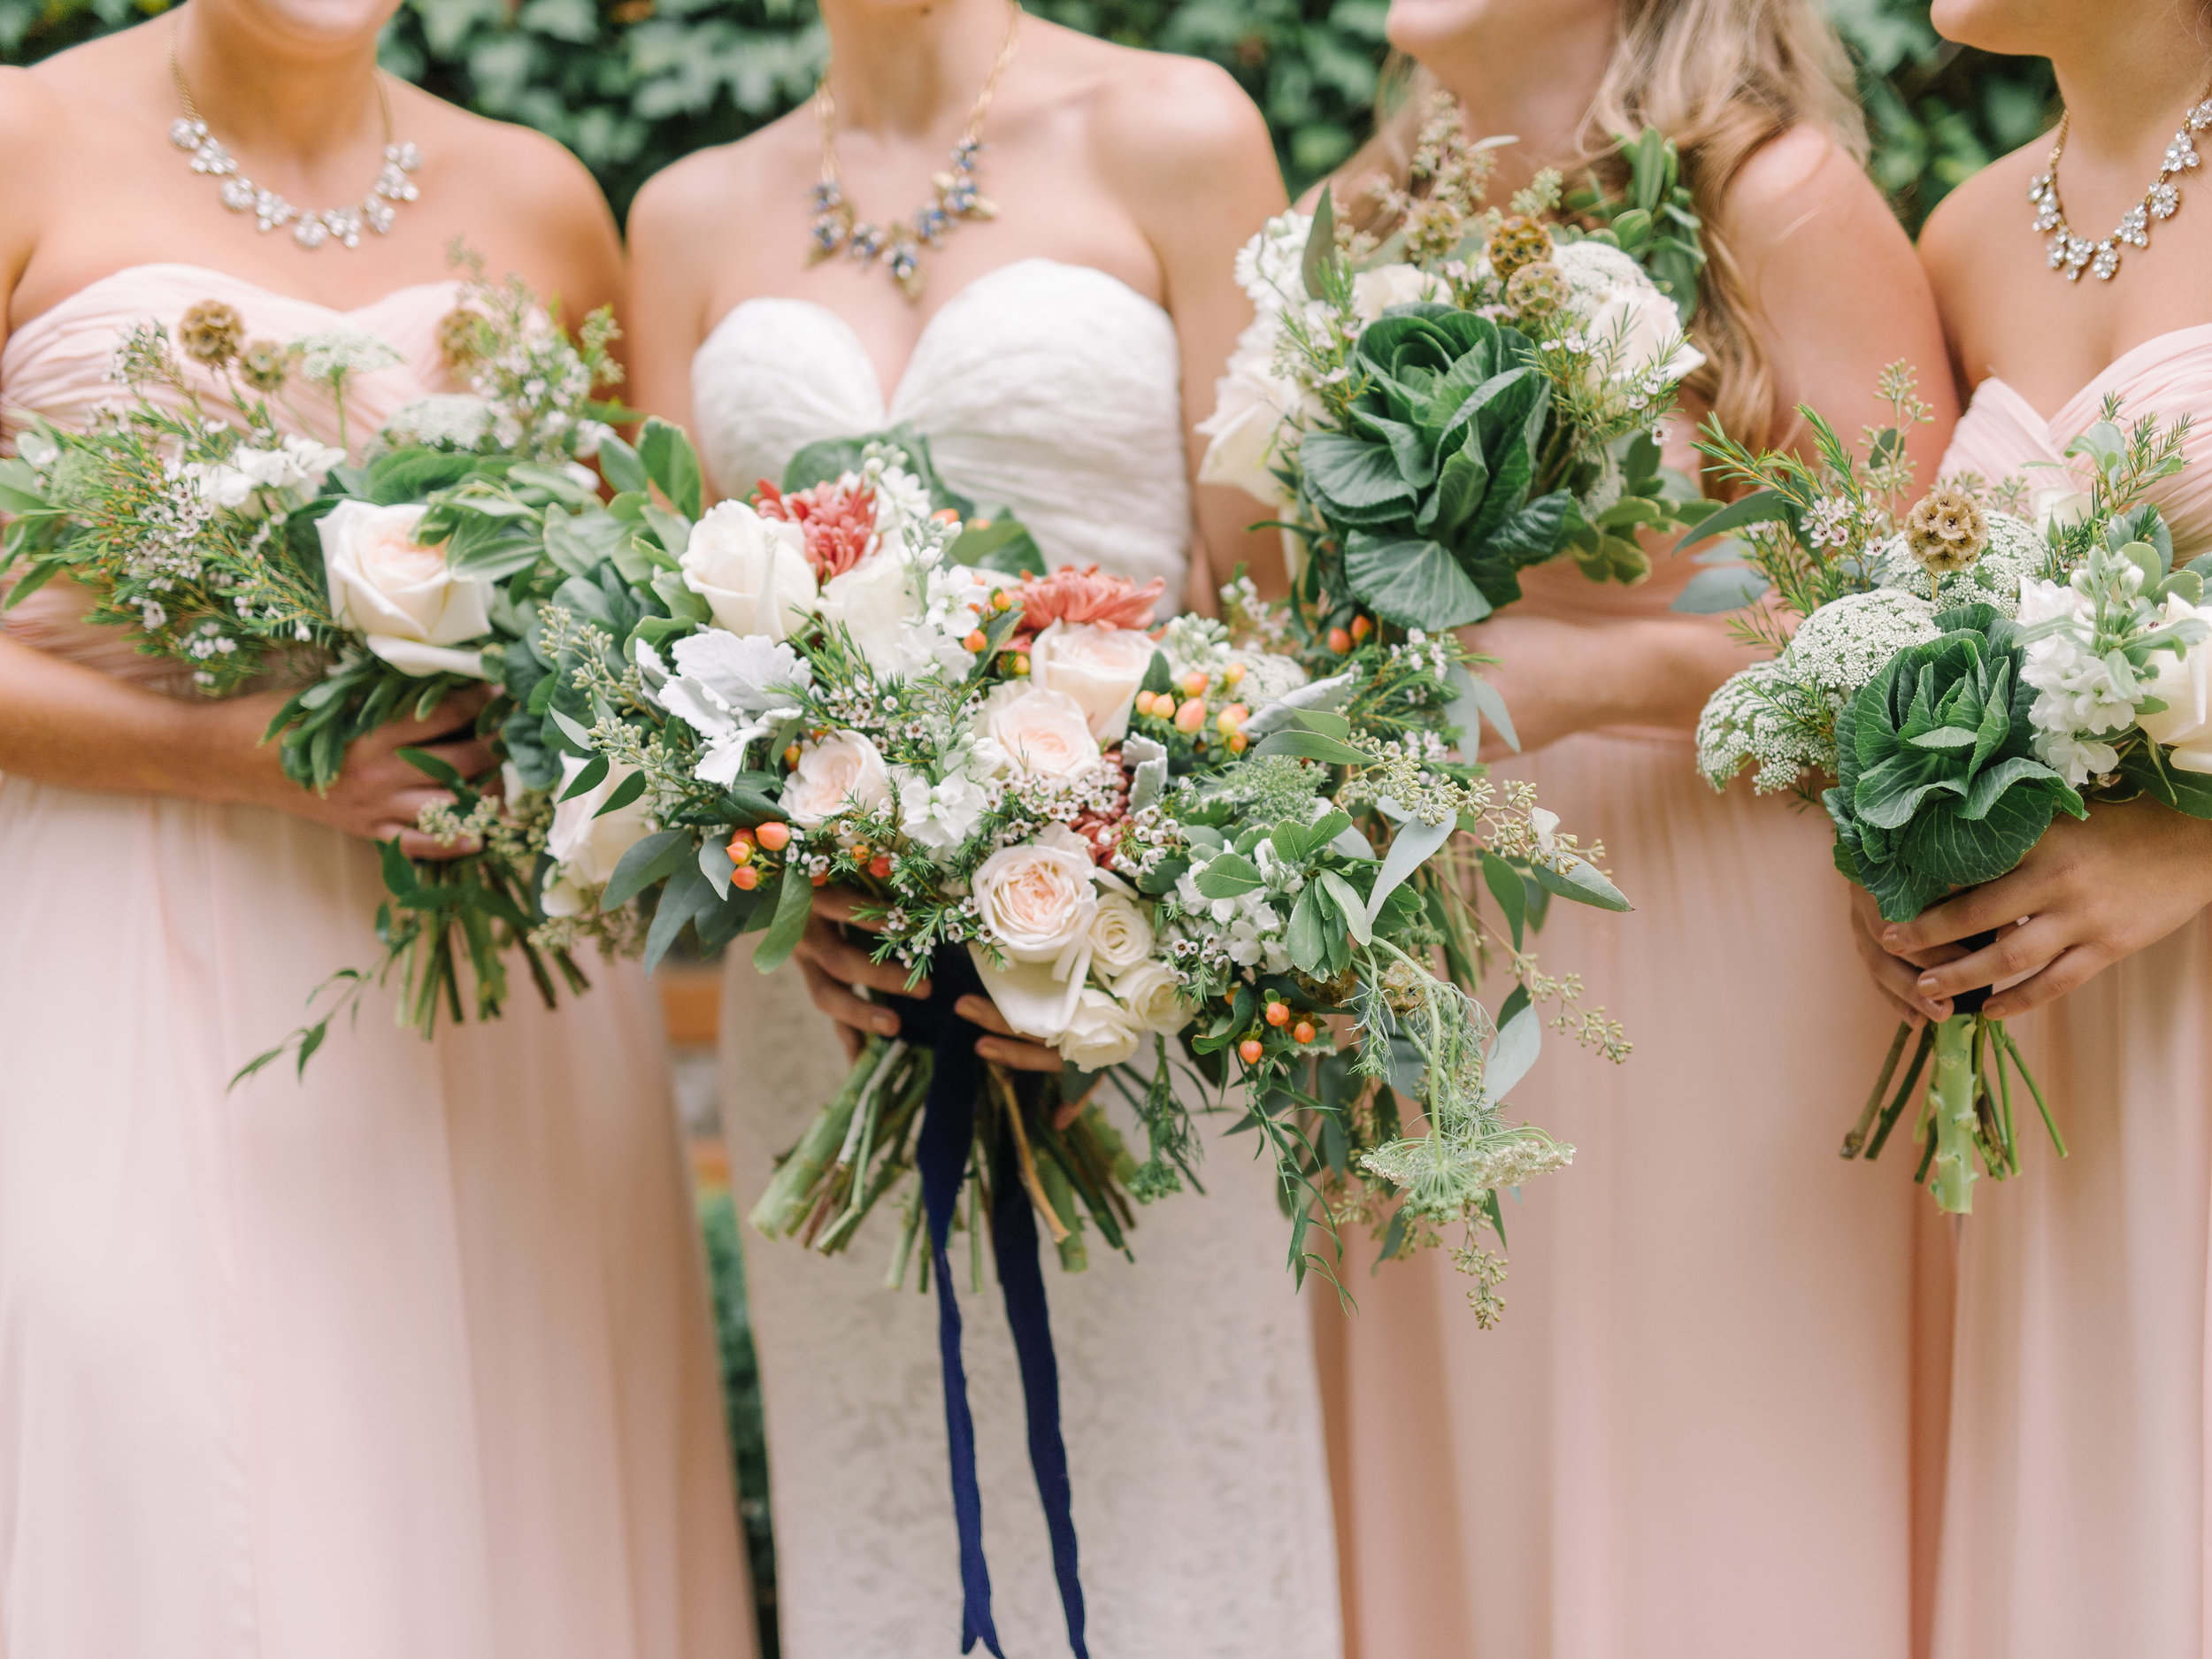 amber-and-paul-rach-loves-troy-charles-h-morris-center-wedding-sarah-seven-helene-lace-wedding-dress-ivory-and-beau-bridal-boutique-savannah-wedding-planner-savannah-event-designer-savannah-florist-savannah-weddings-savannah-bridal-boutique-16.jpg